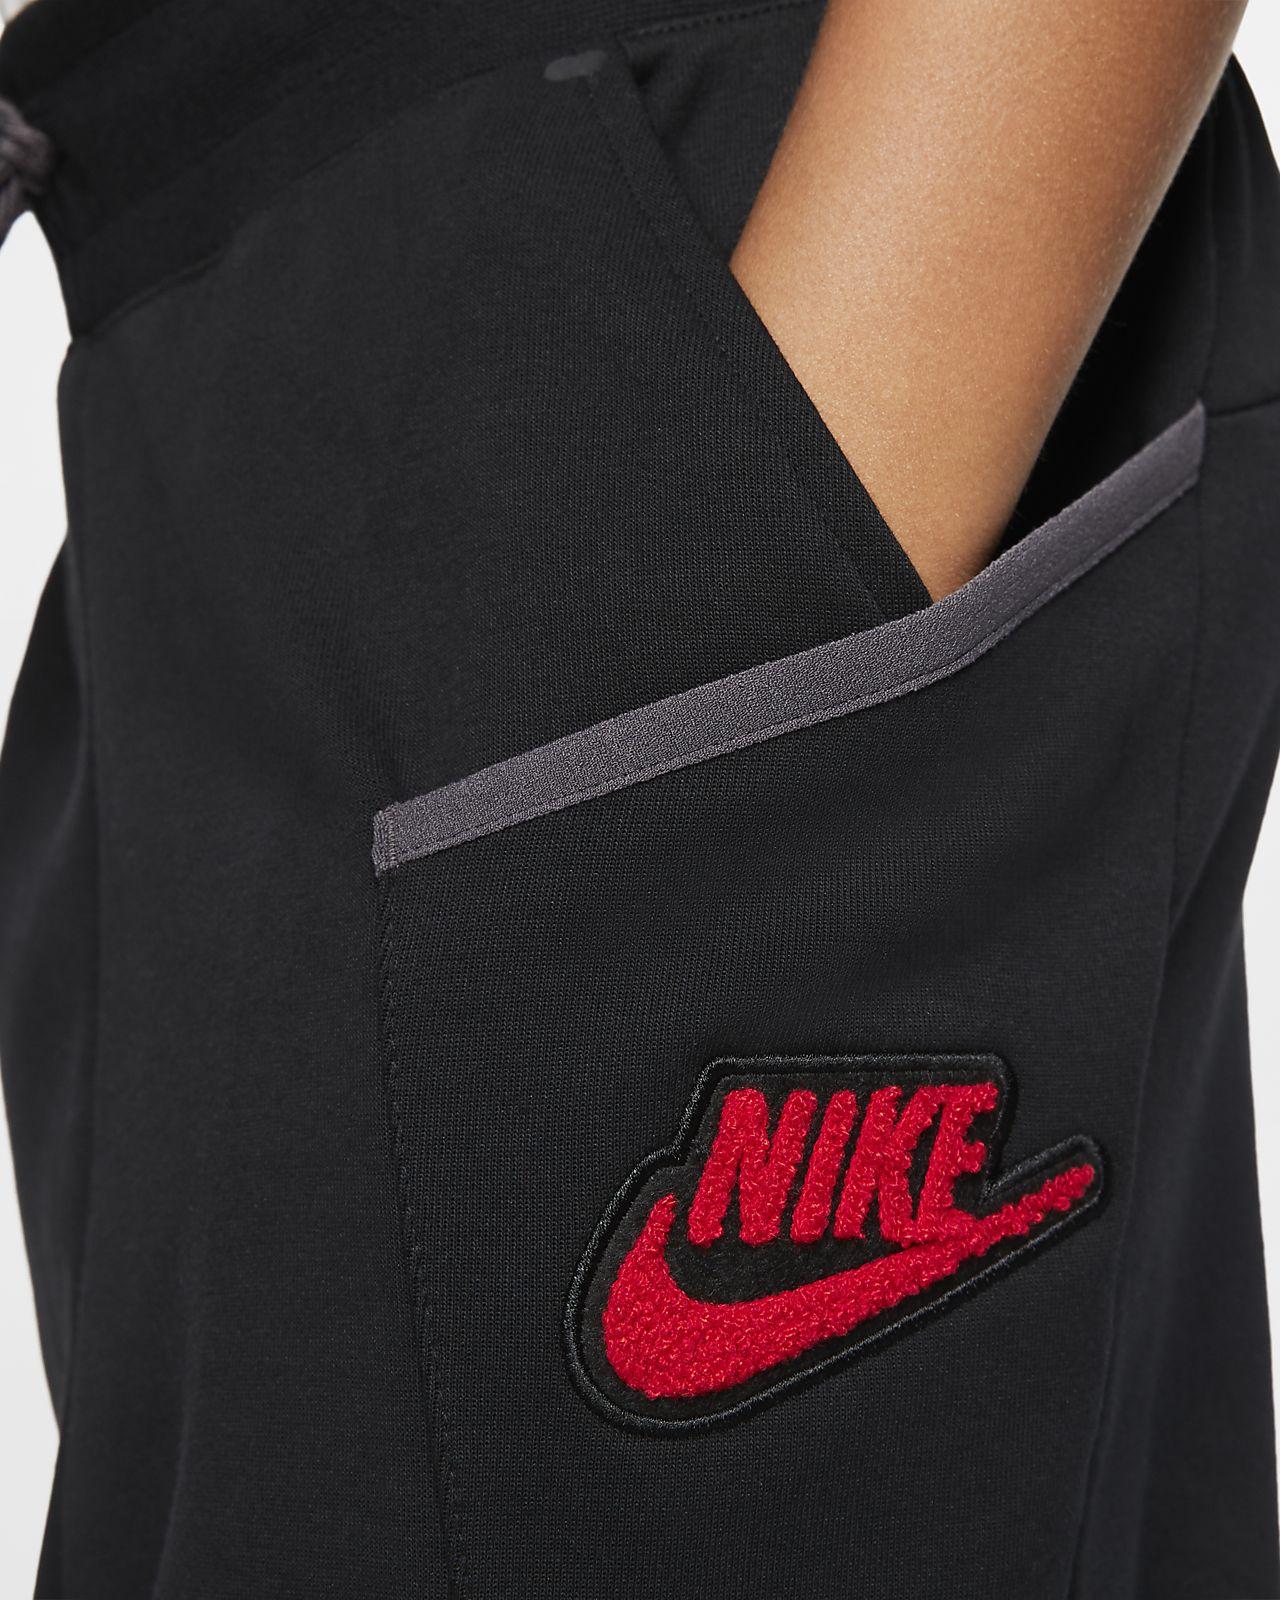 9f98ce9ad4ac8 Nike Sportswear Tech Fleece Big Kids' (Boys') Pants. Nike.com